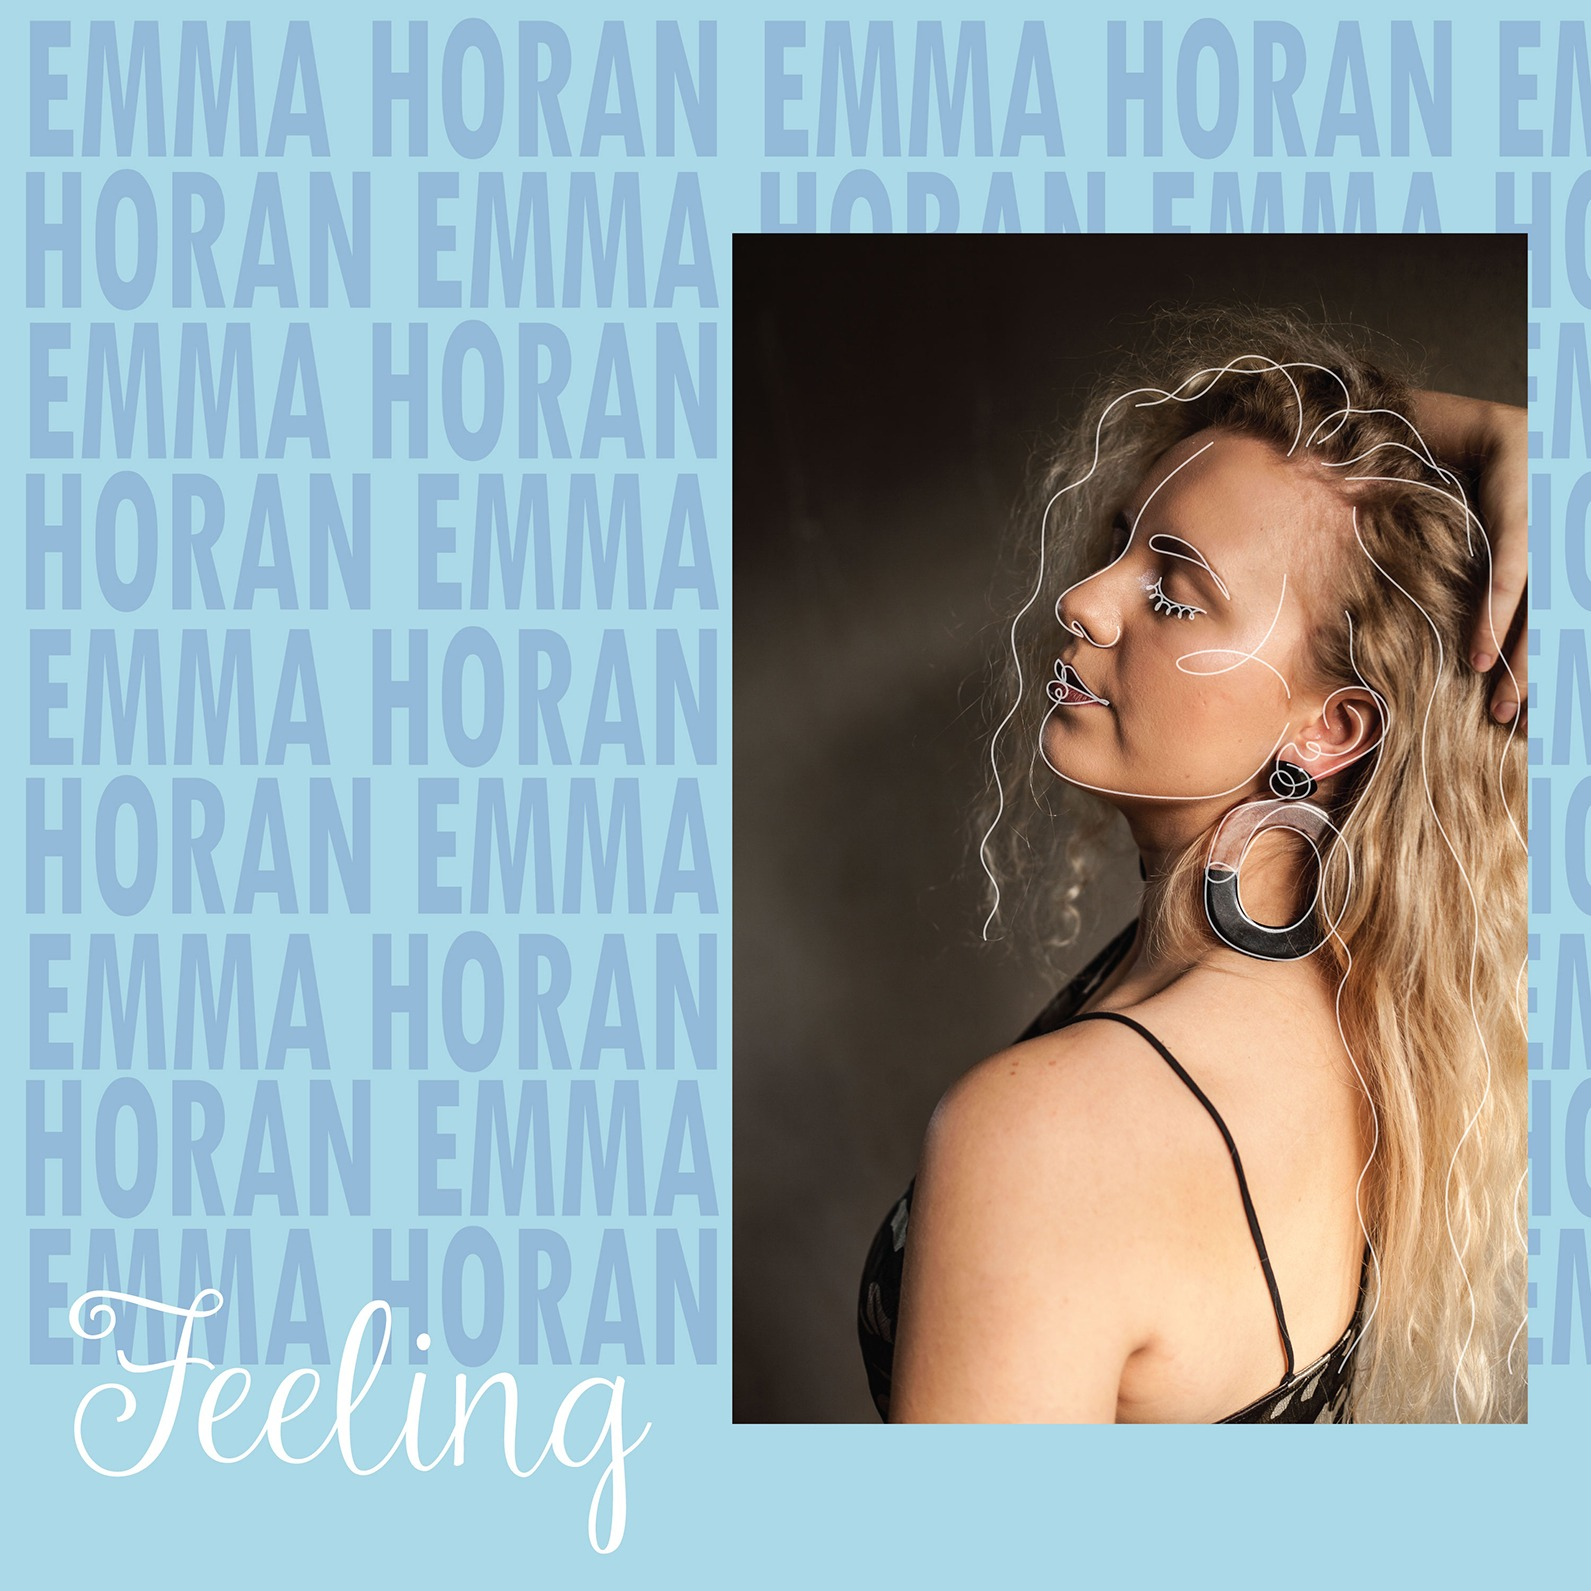 Emma Horan